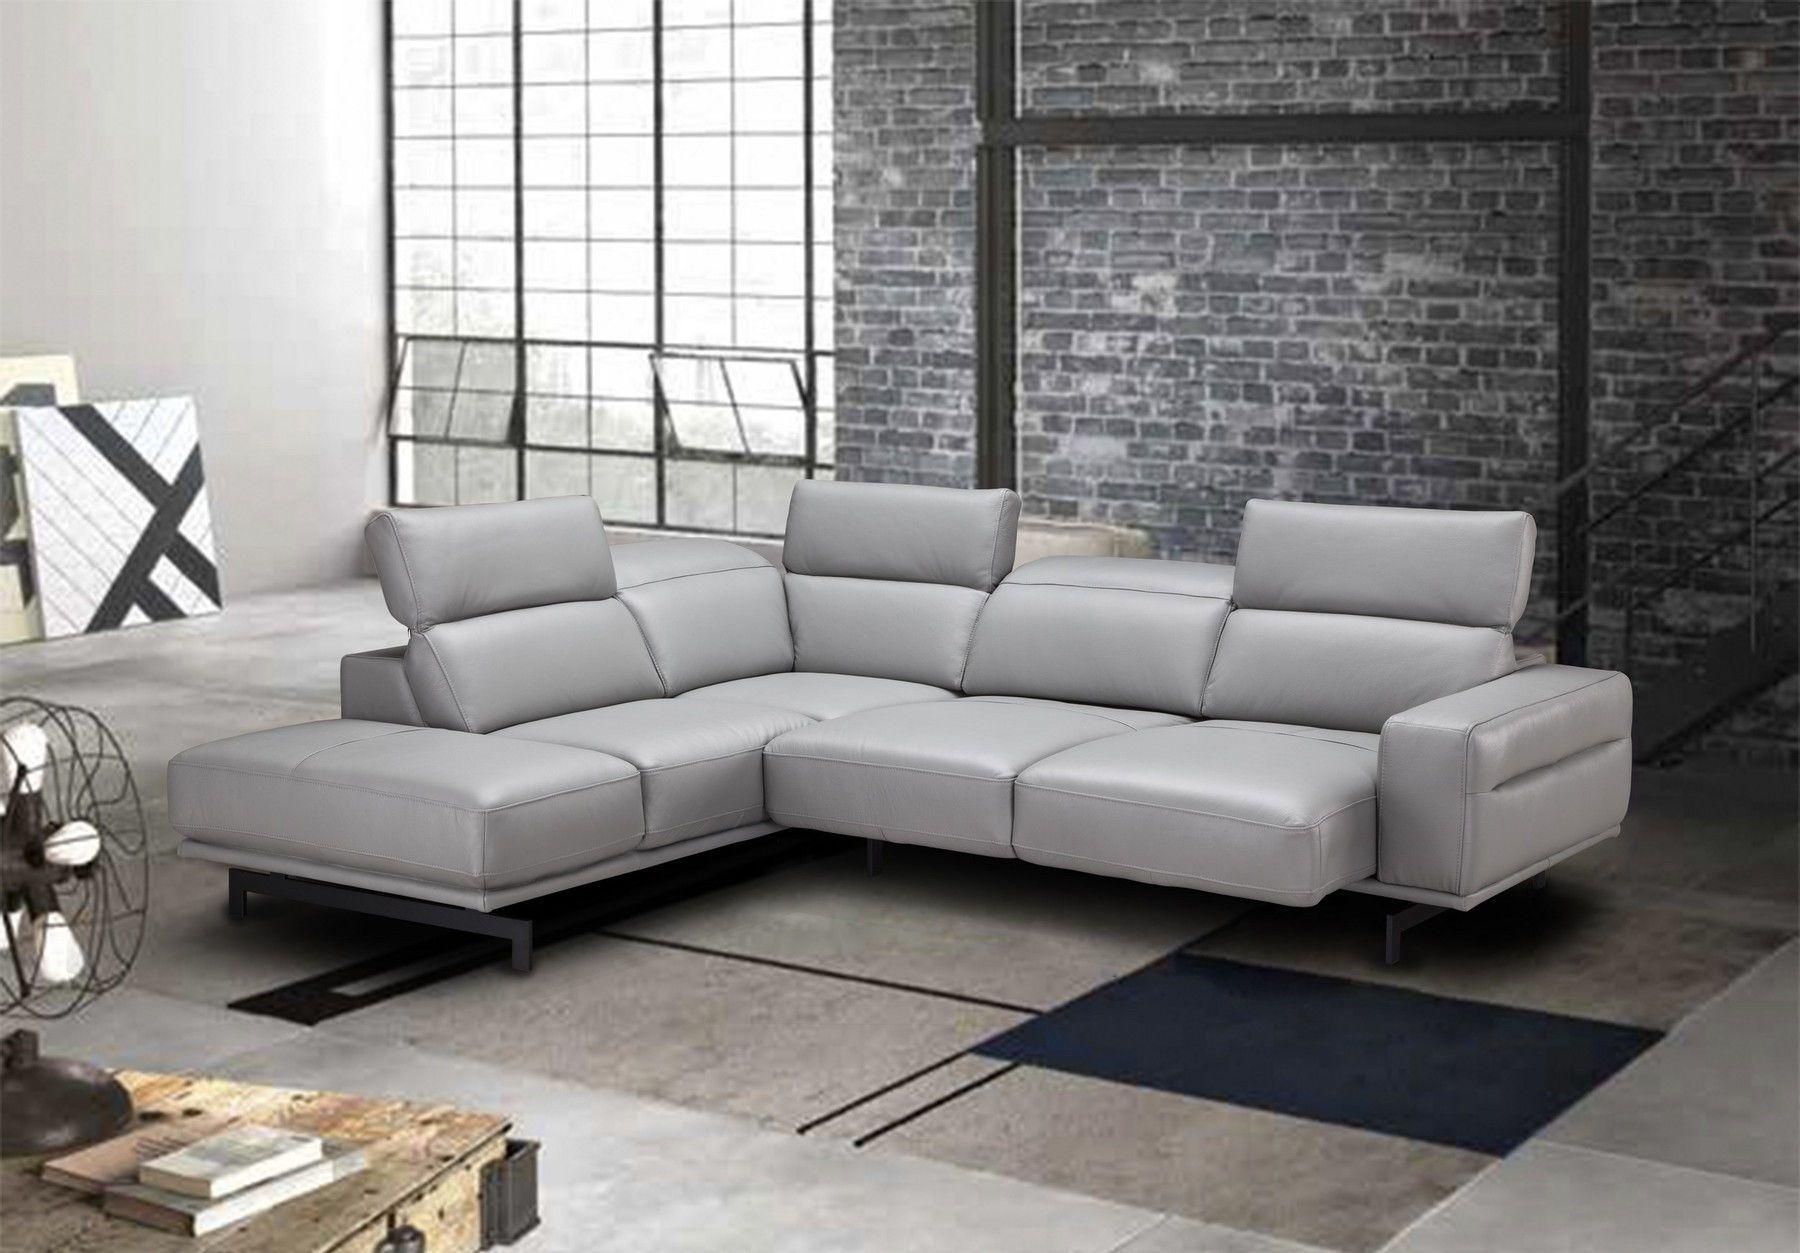 Davenport Lf Light Gray Sectional Sofa 17981 J M Sectional Sofas In 2020 Top Grain Leather Sectional Leather Sectional Grey Sectional Sofa